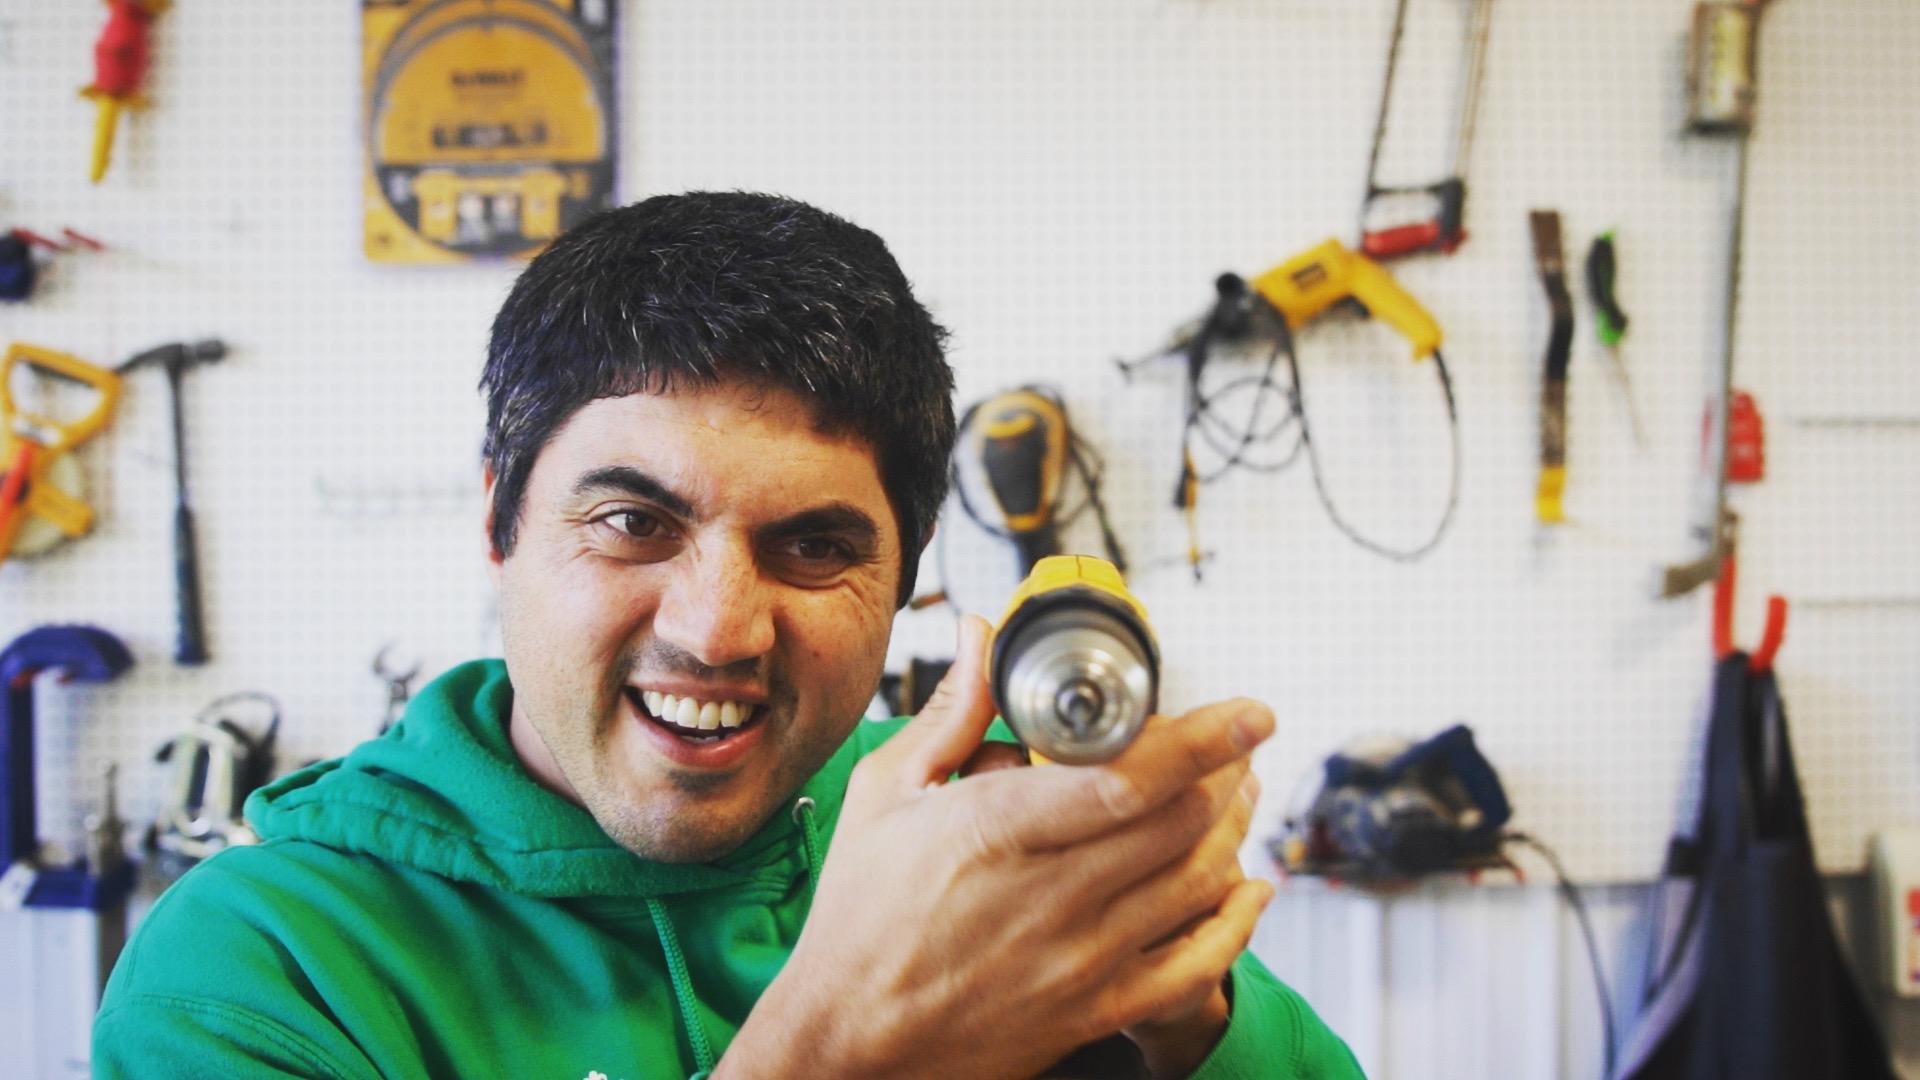 Save Hundreds On Homesteading Gear